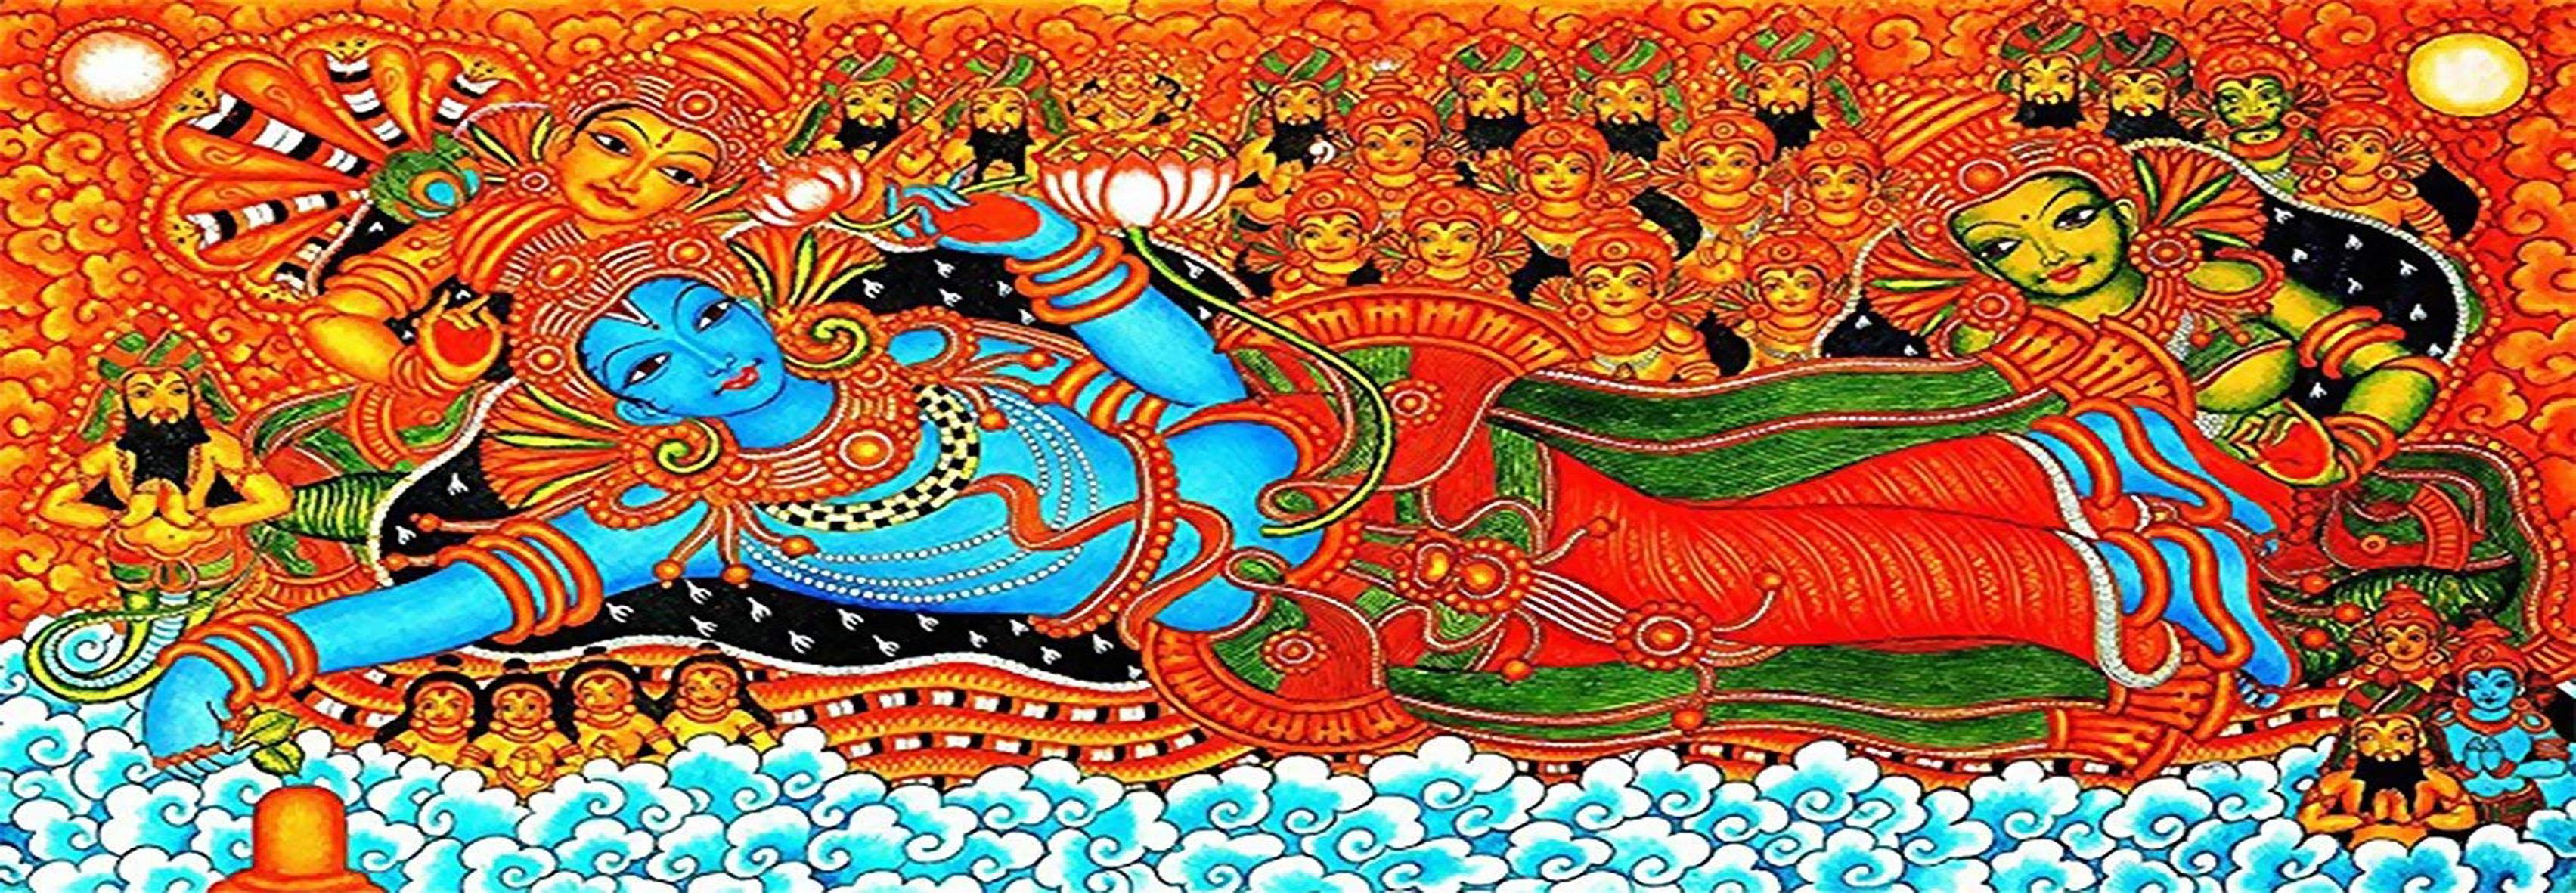 3002N00025 - Kerala Mural- Vishnu Avatar